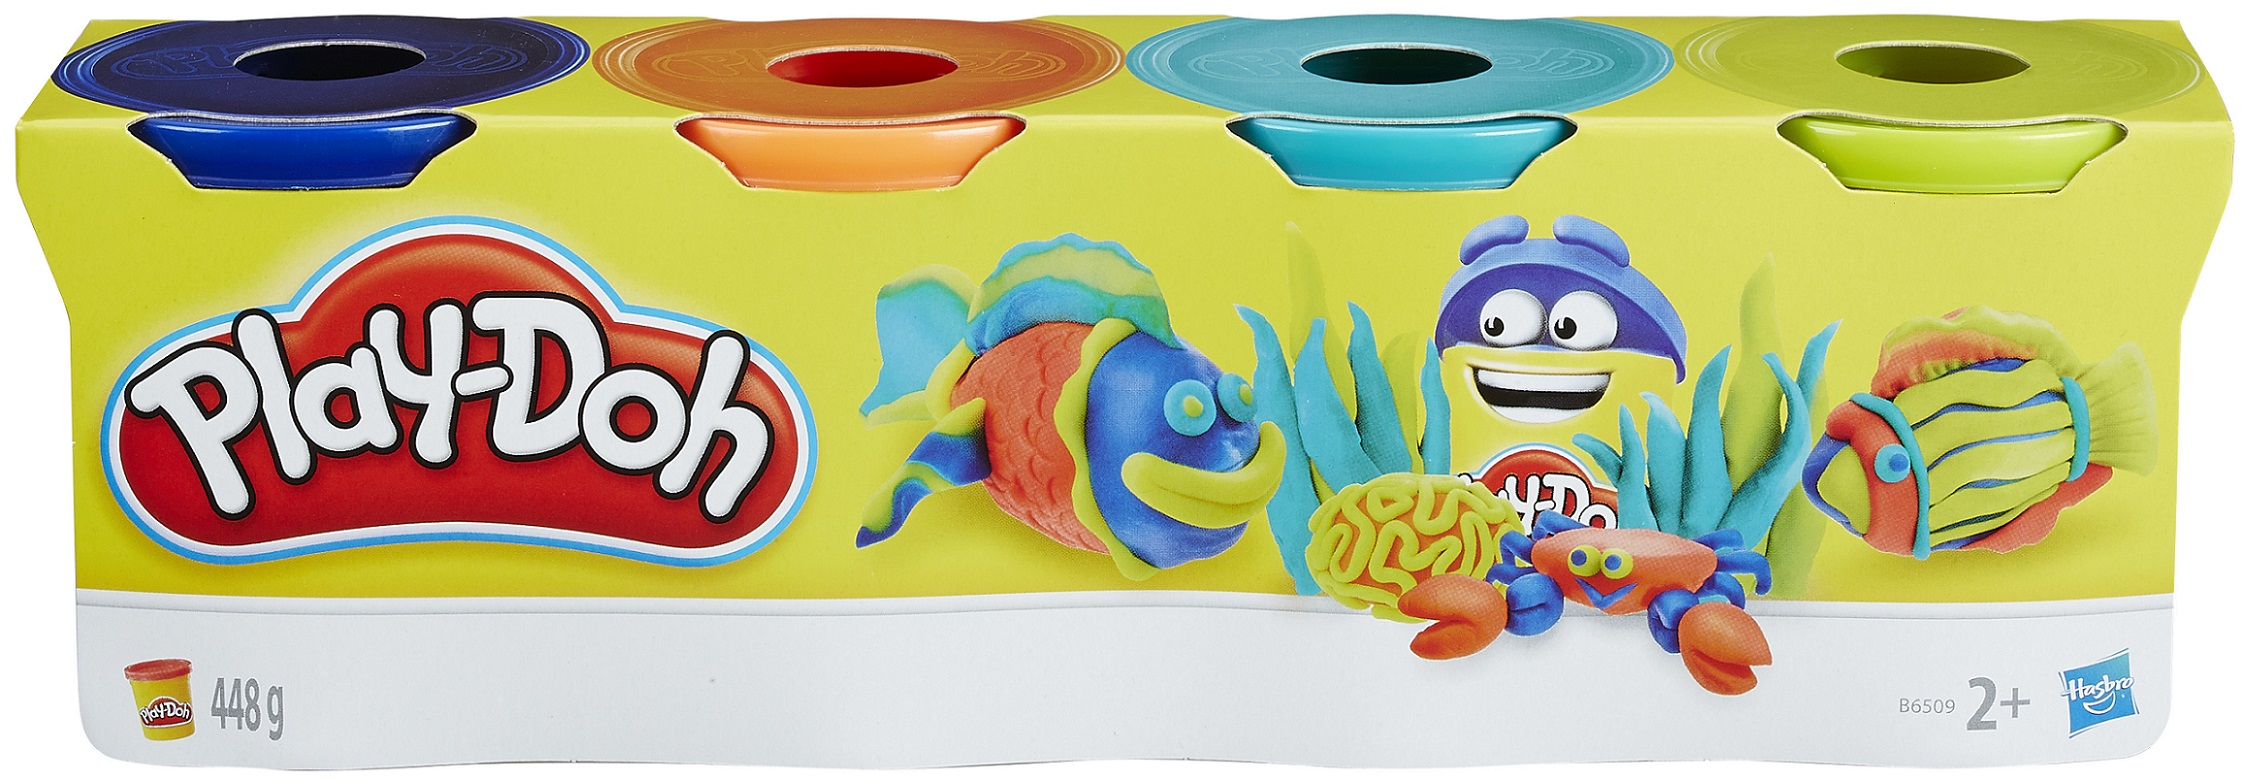 Творч Play-Doh Пластилин 4 банки (в ассорт.) МАХ СКИДКА 15% РОЗНИЦА